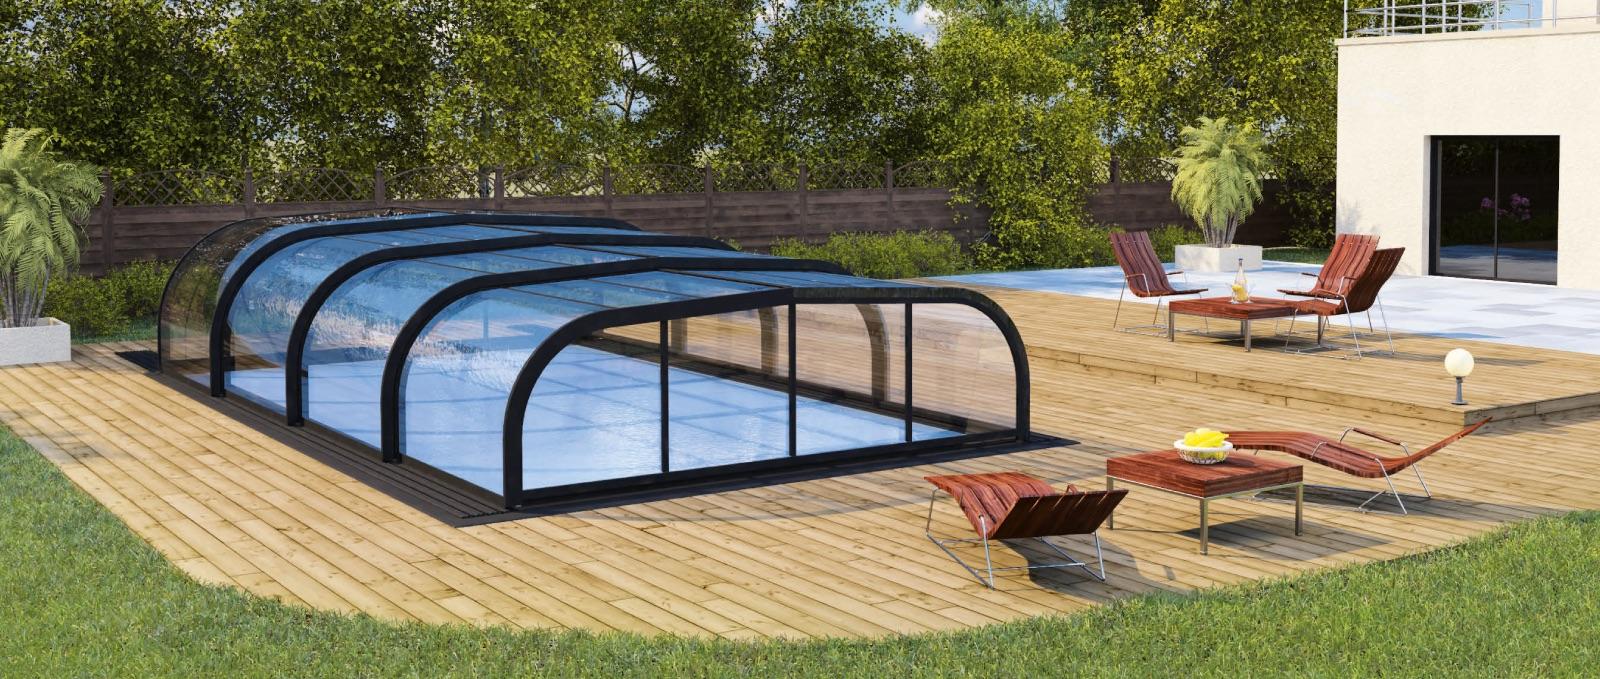 abri piscine une temp rature id ale en continu. Black Bedroom Furniture Sets. Home Design Ideas